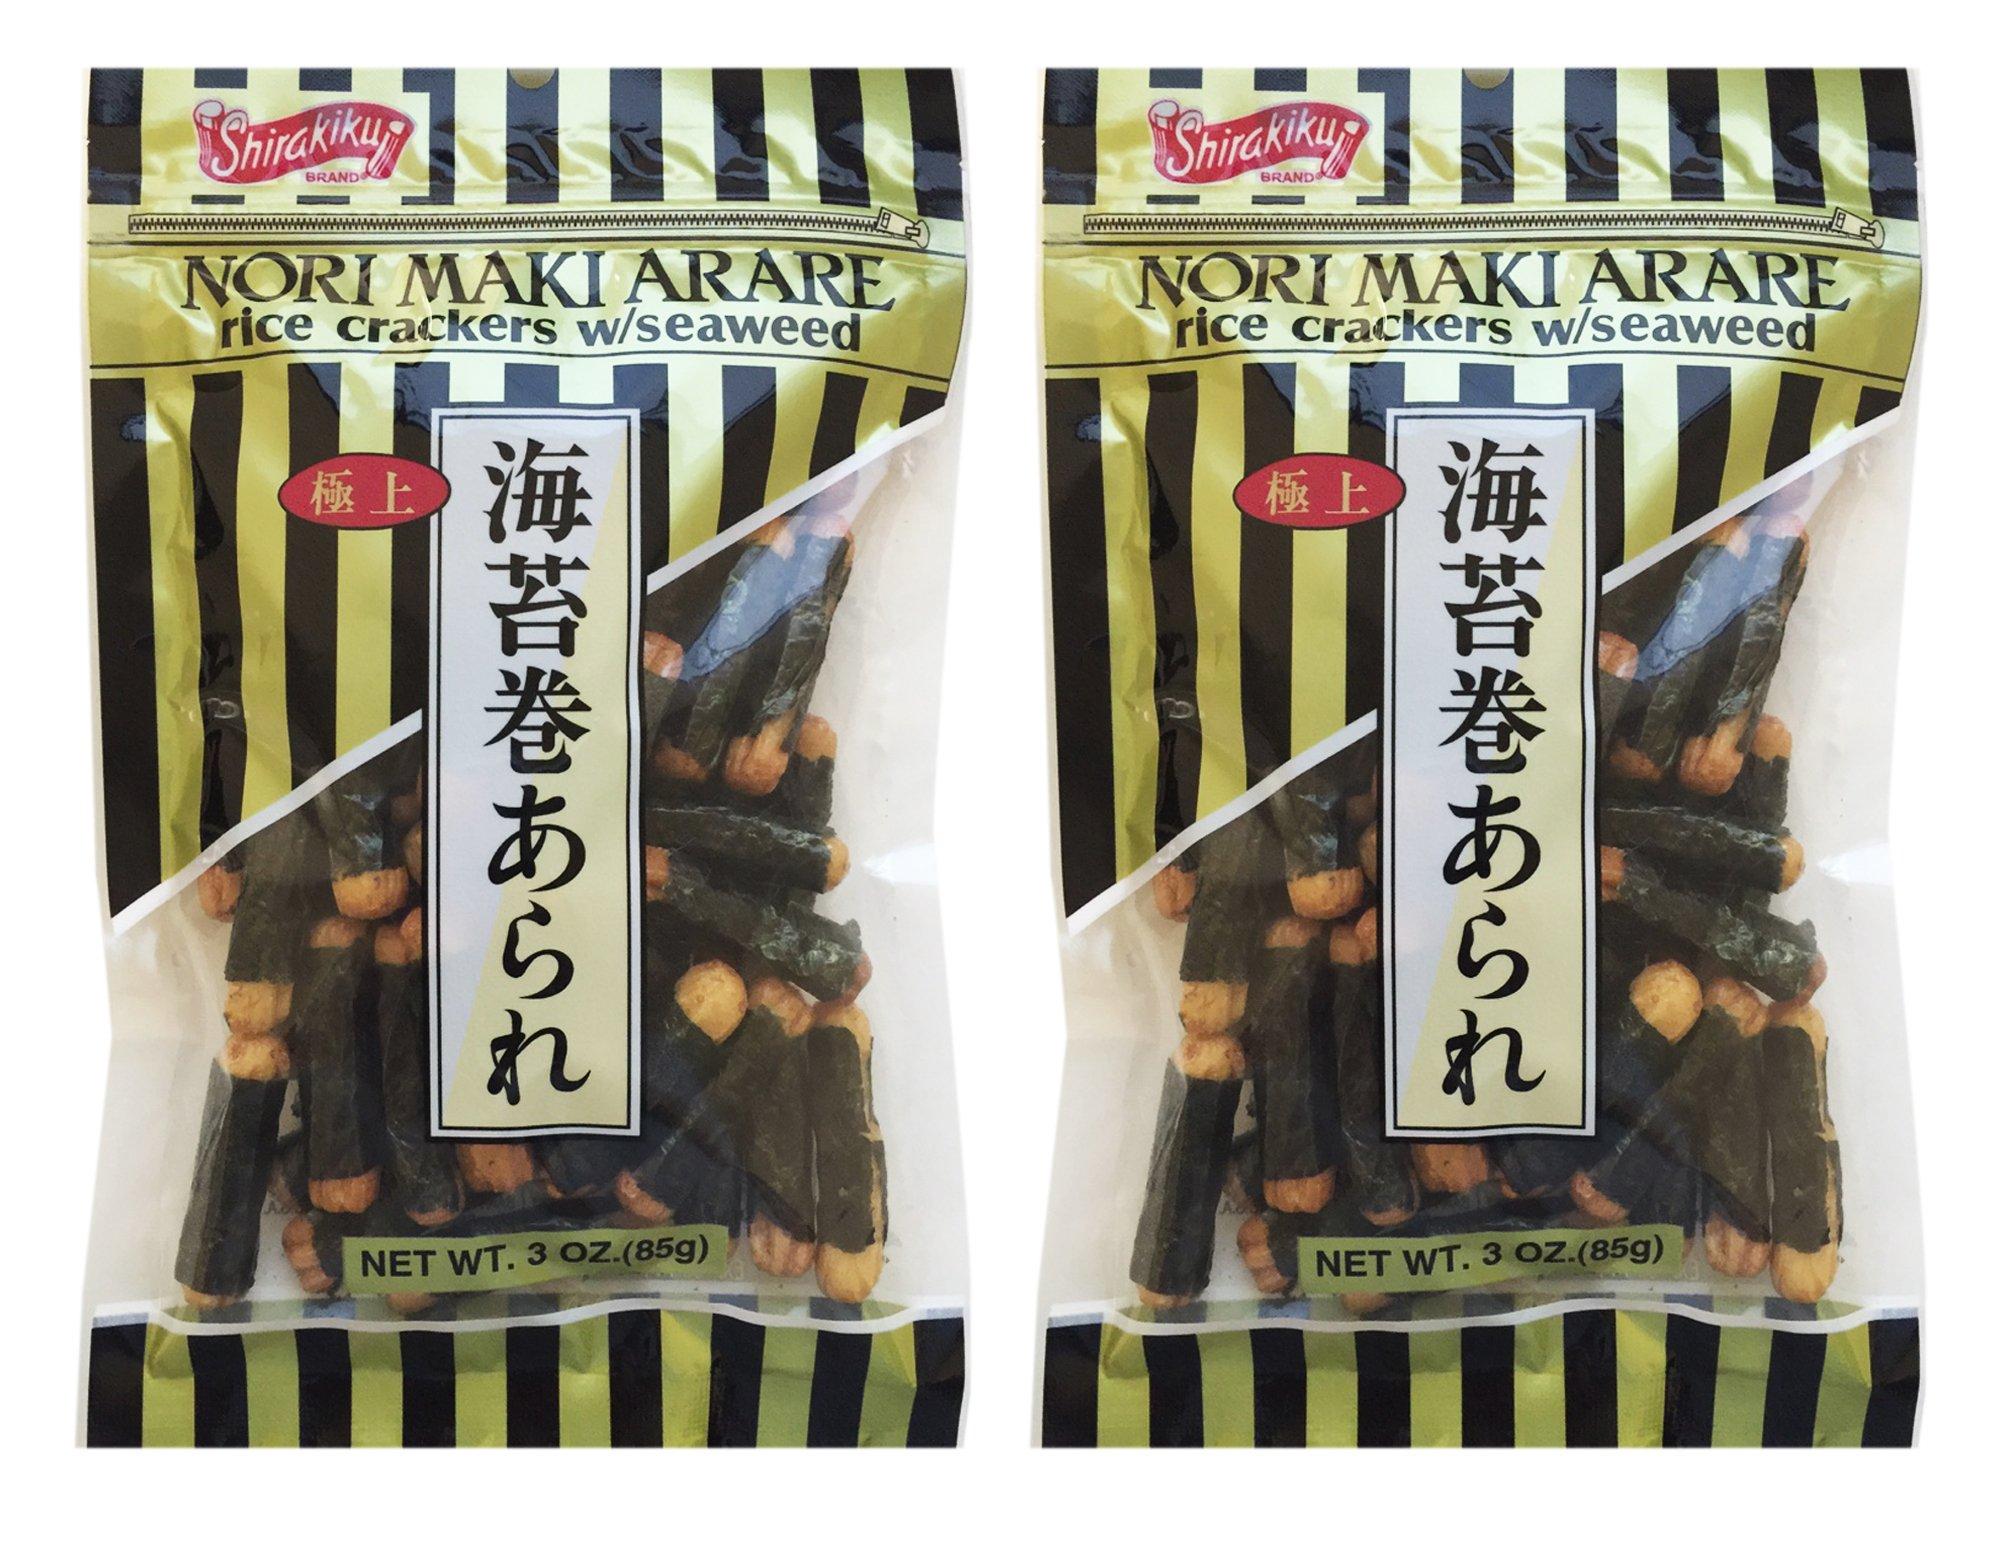 Japanese Shirakiku Nori Maki Arare Rice Crackers With Seaweed Snack 3oz (Pack of 2)